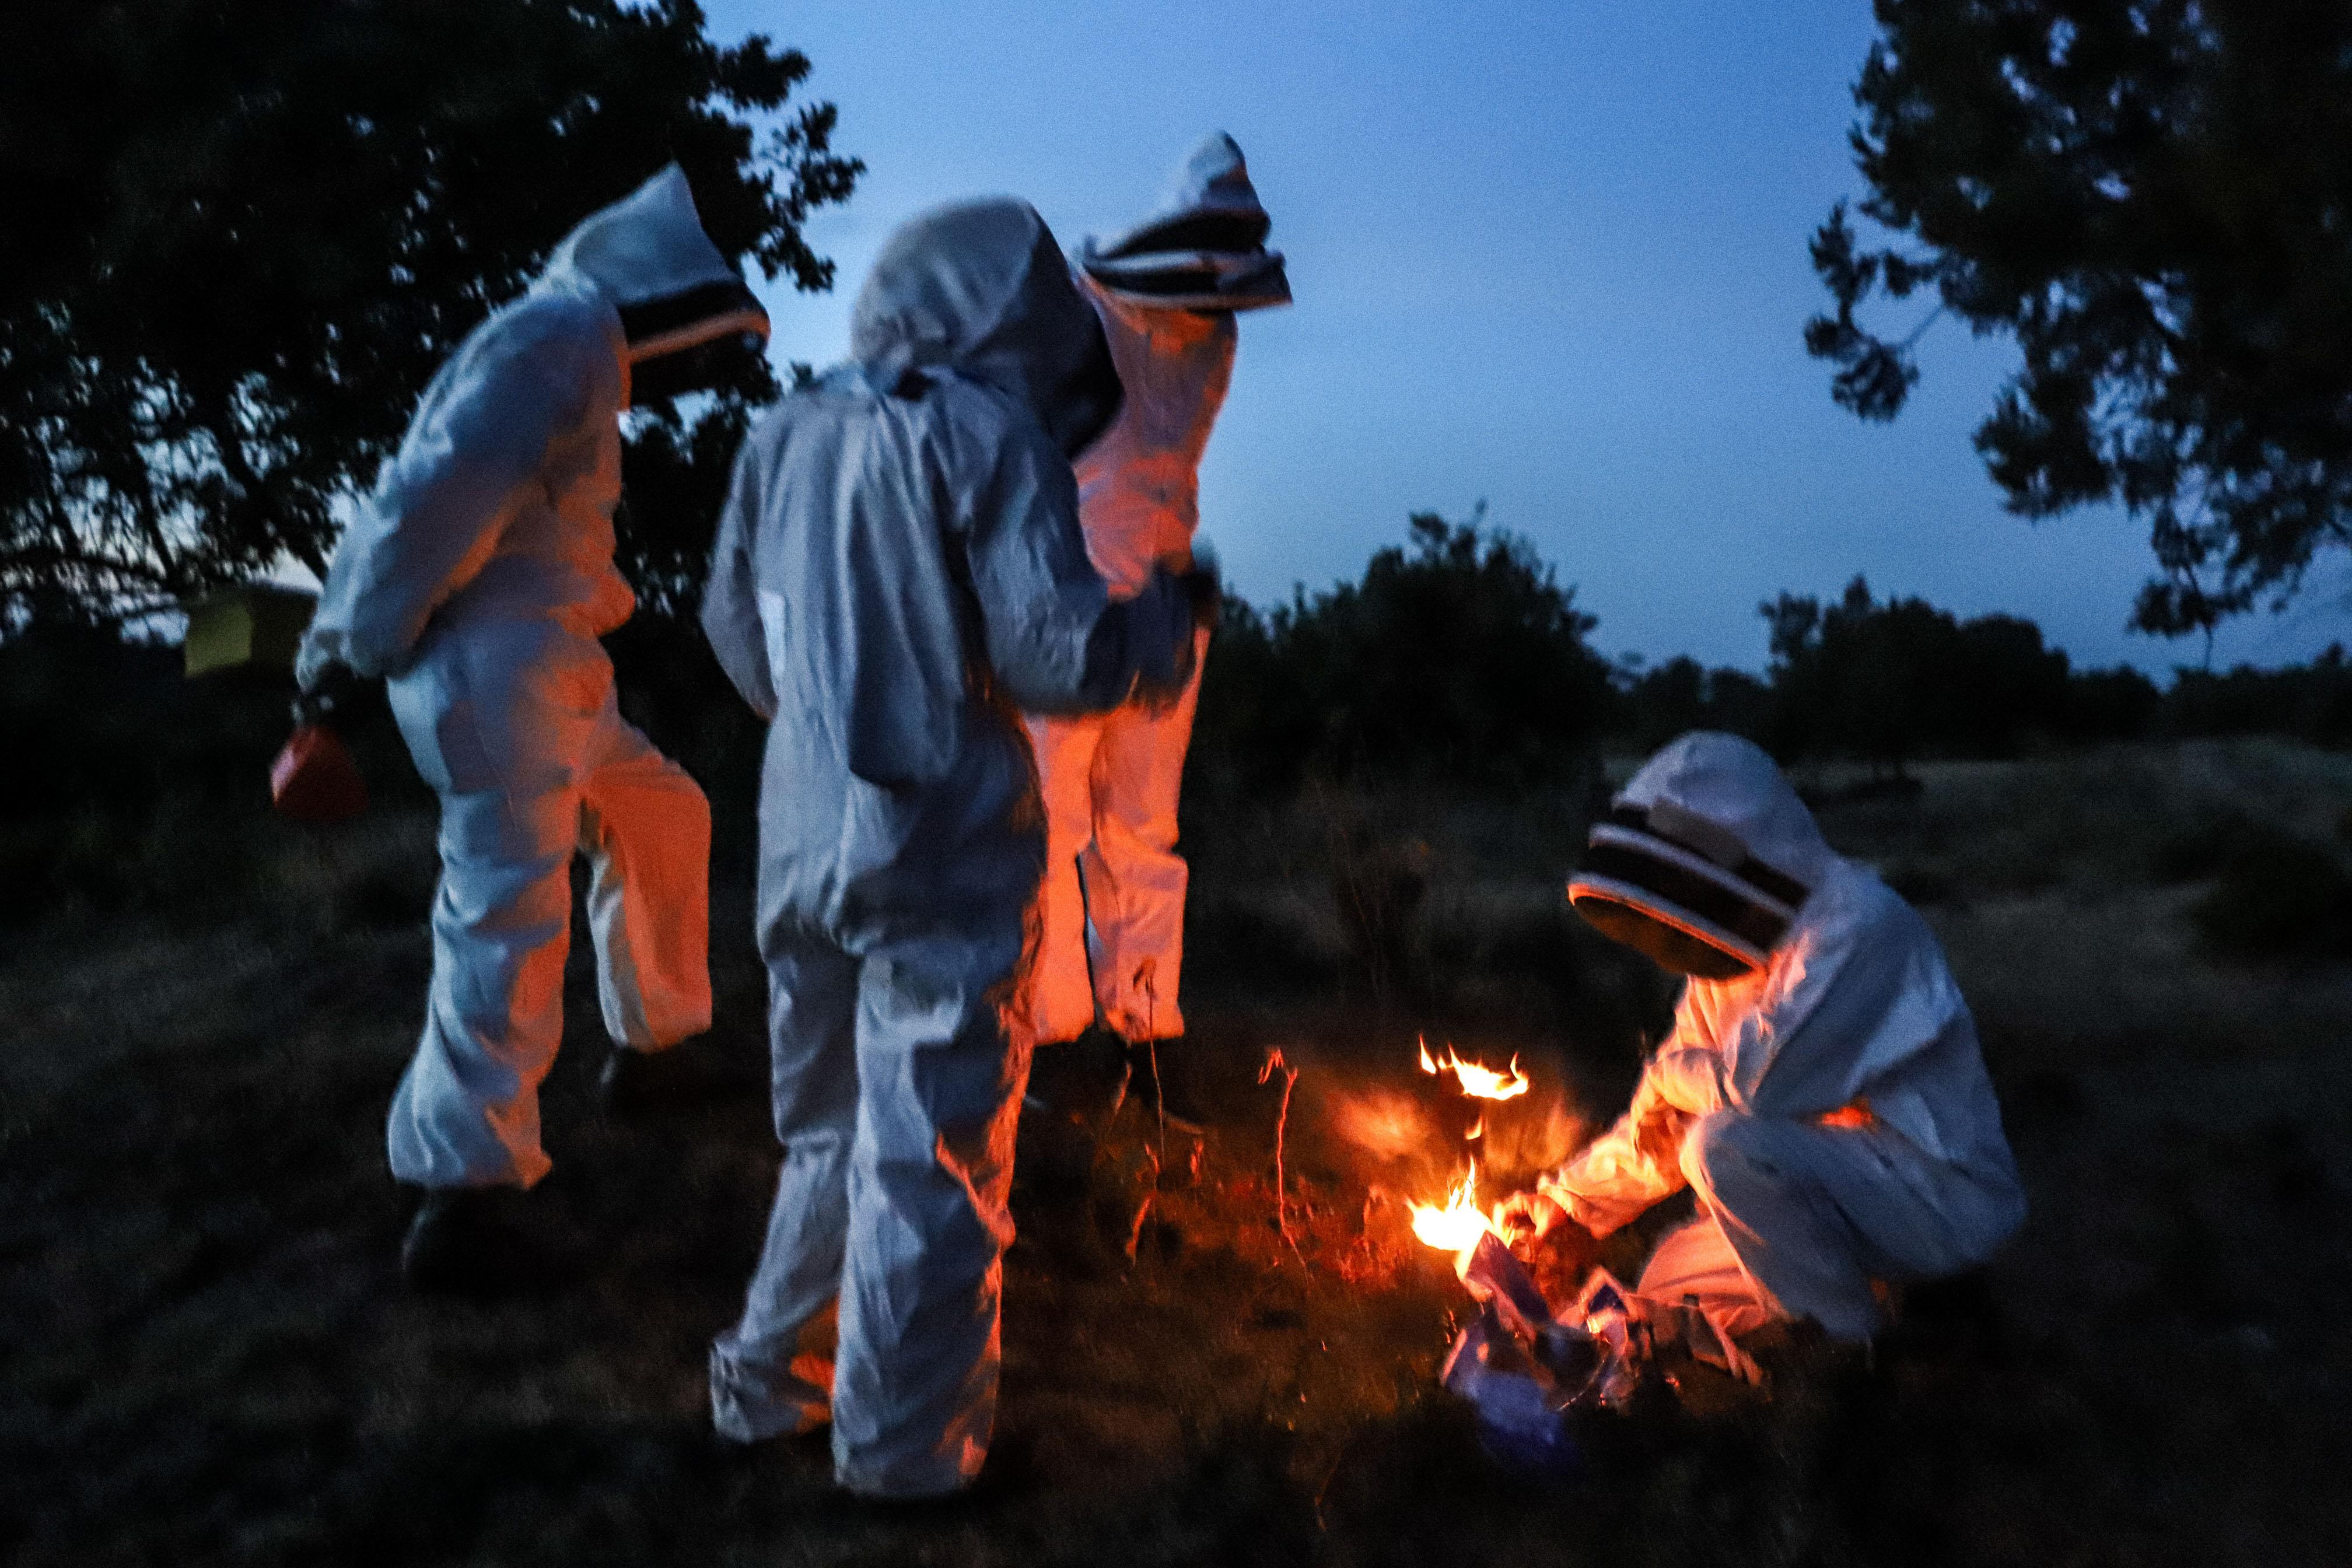 Lighting-the-smoker-during-beehive-fence-construction-in-Lewa-Meru-County5-©-2019-Naiya-Raja